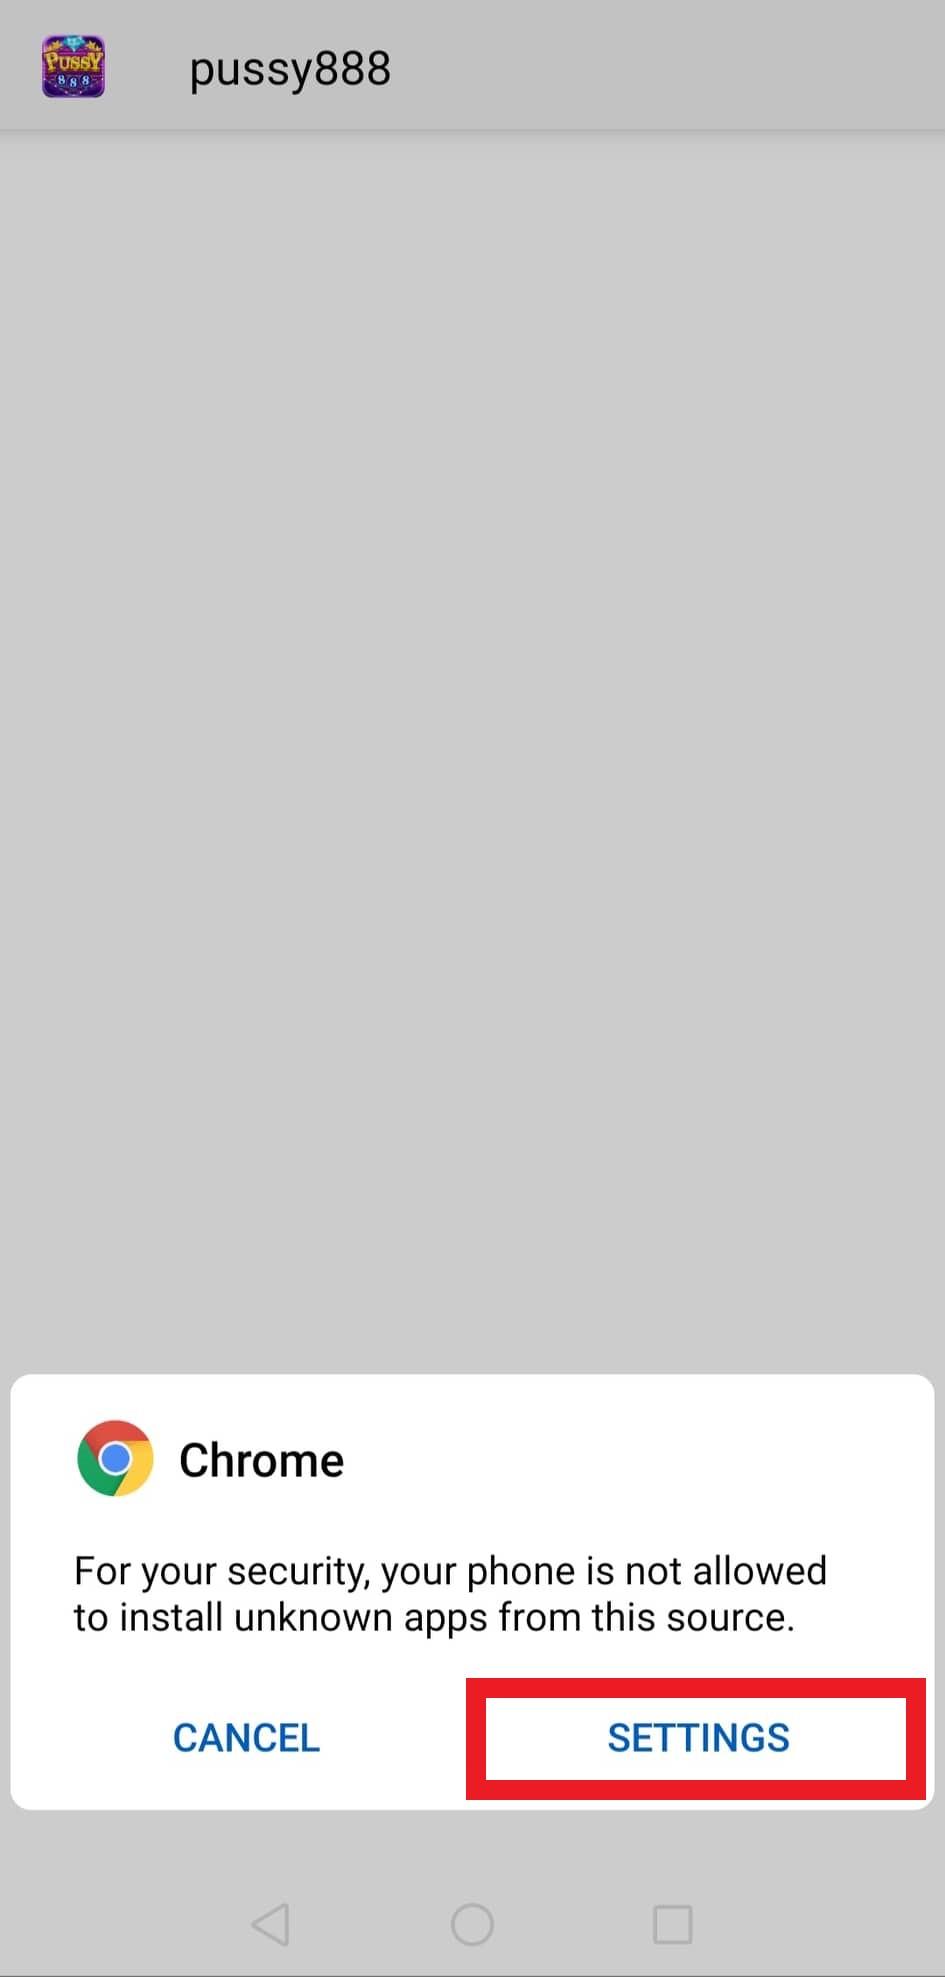 Unduh Pussy888 Android dan iOS